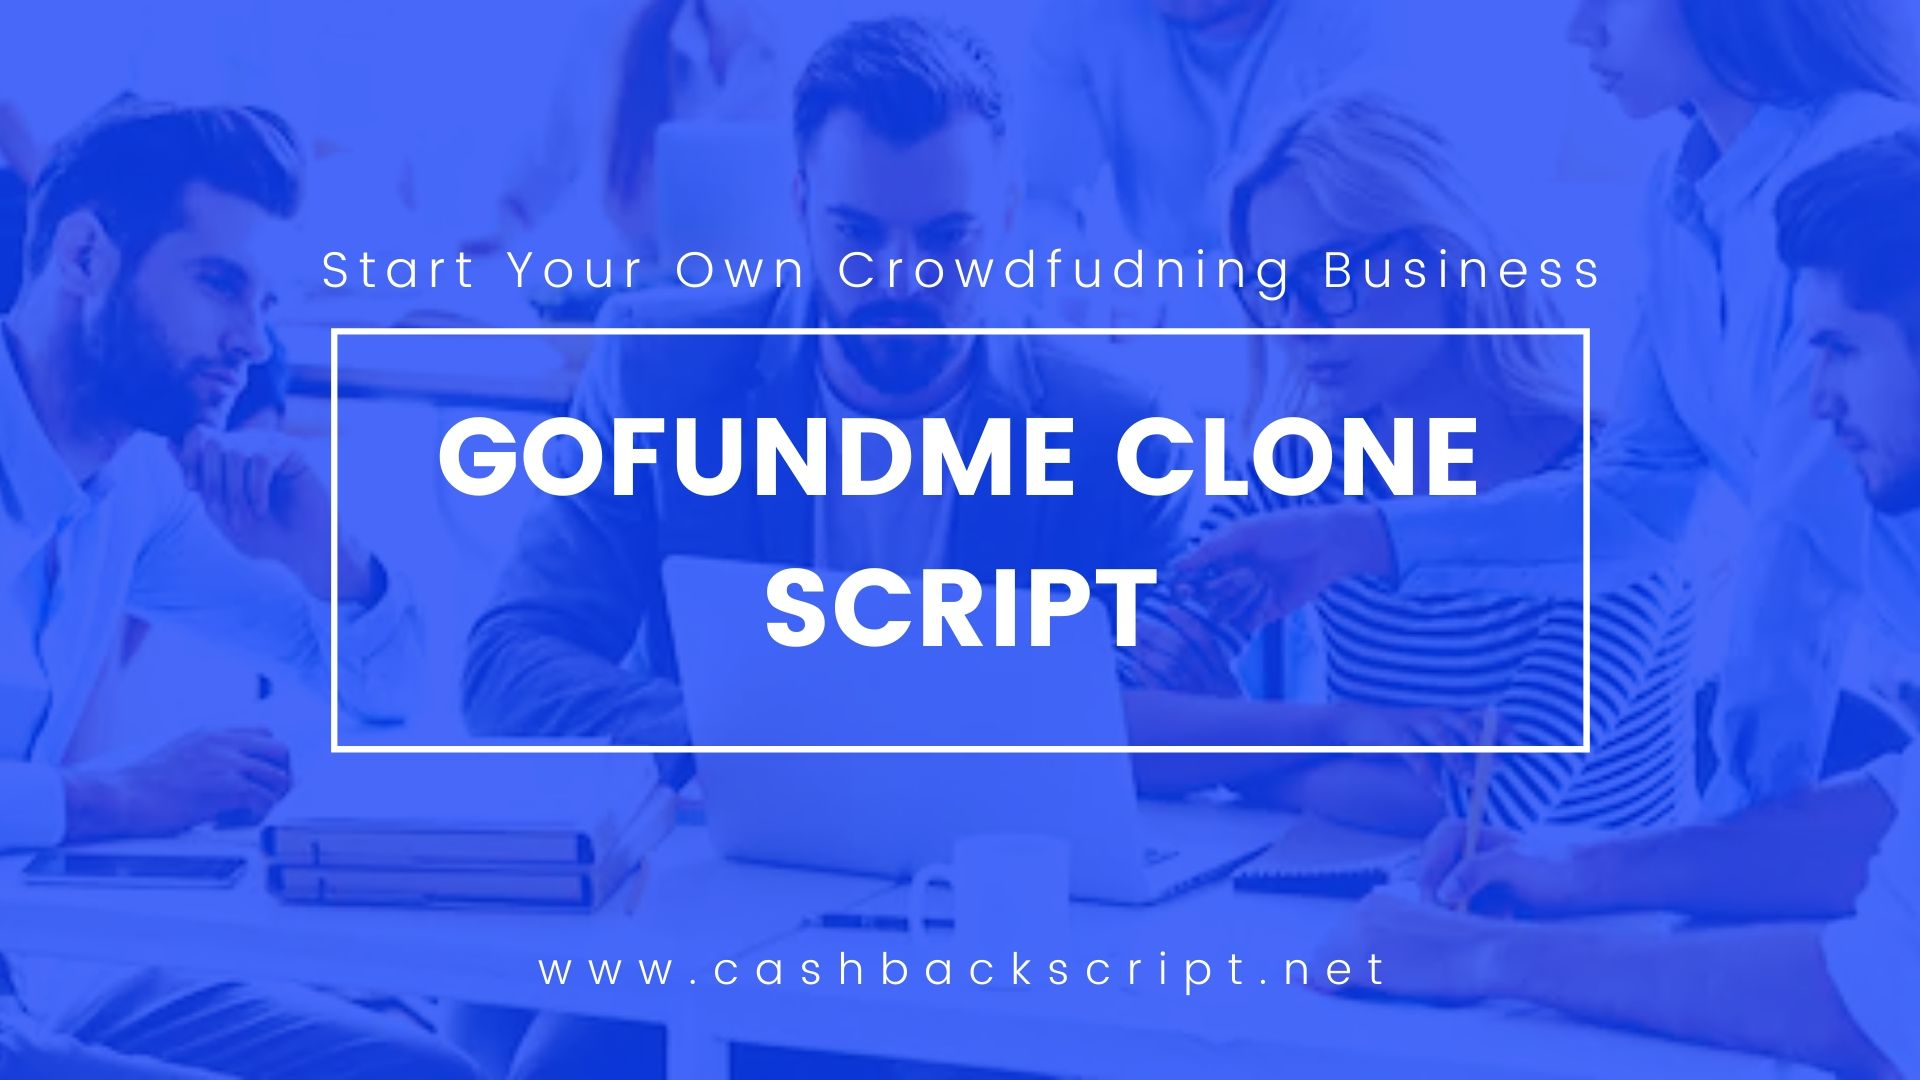 GoFundMe Clone Script to Start Crowdfunding Business Like GoFundMe